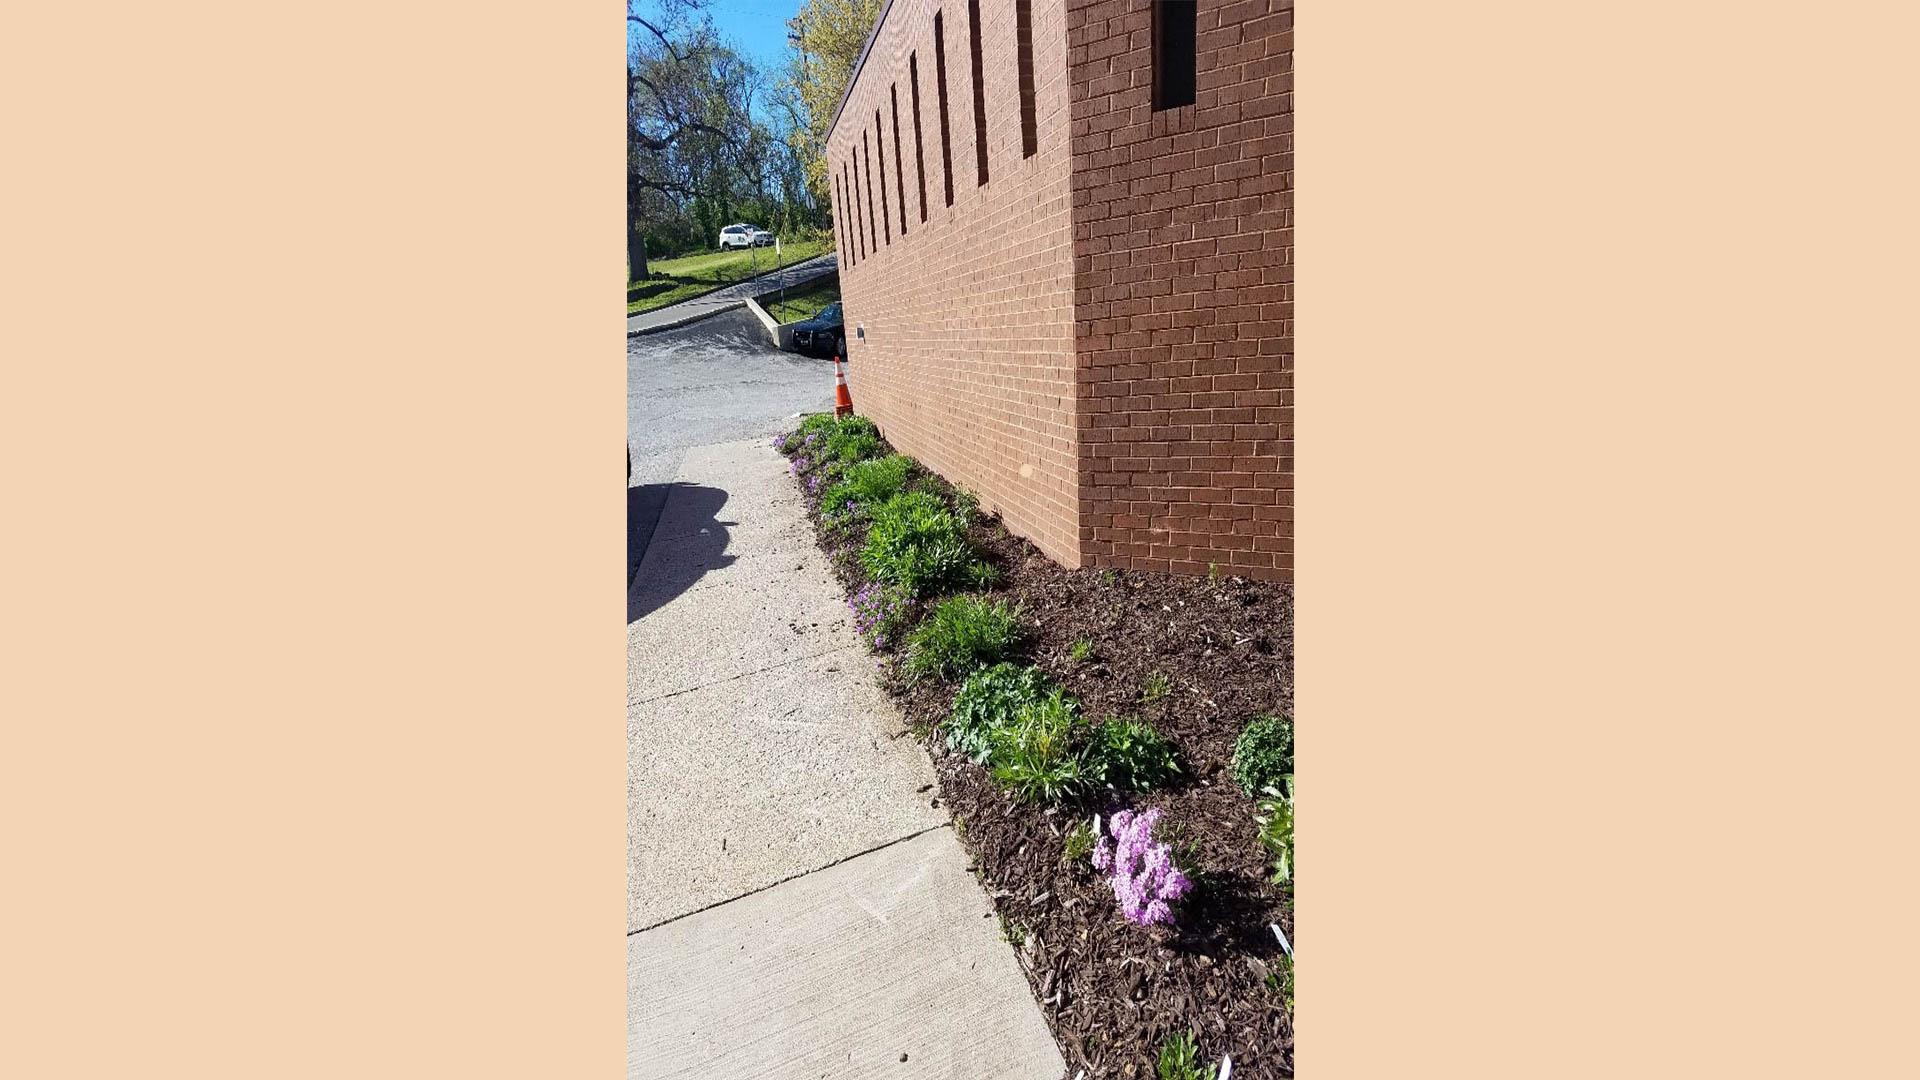 190429 Native GArden City Branson Police Side NOP - Native Gardens Plantings at City Hall Encourages Native Gardens